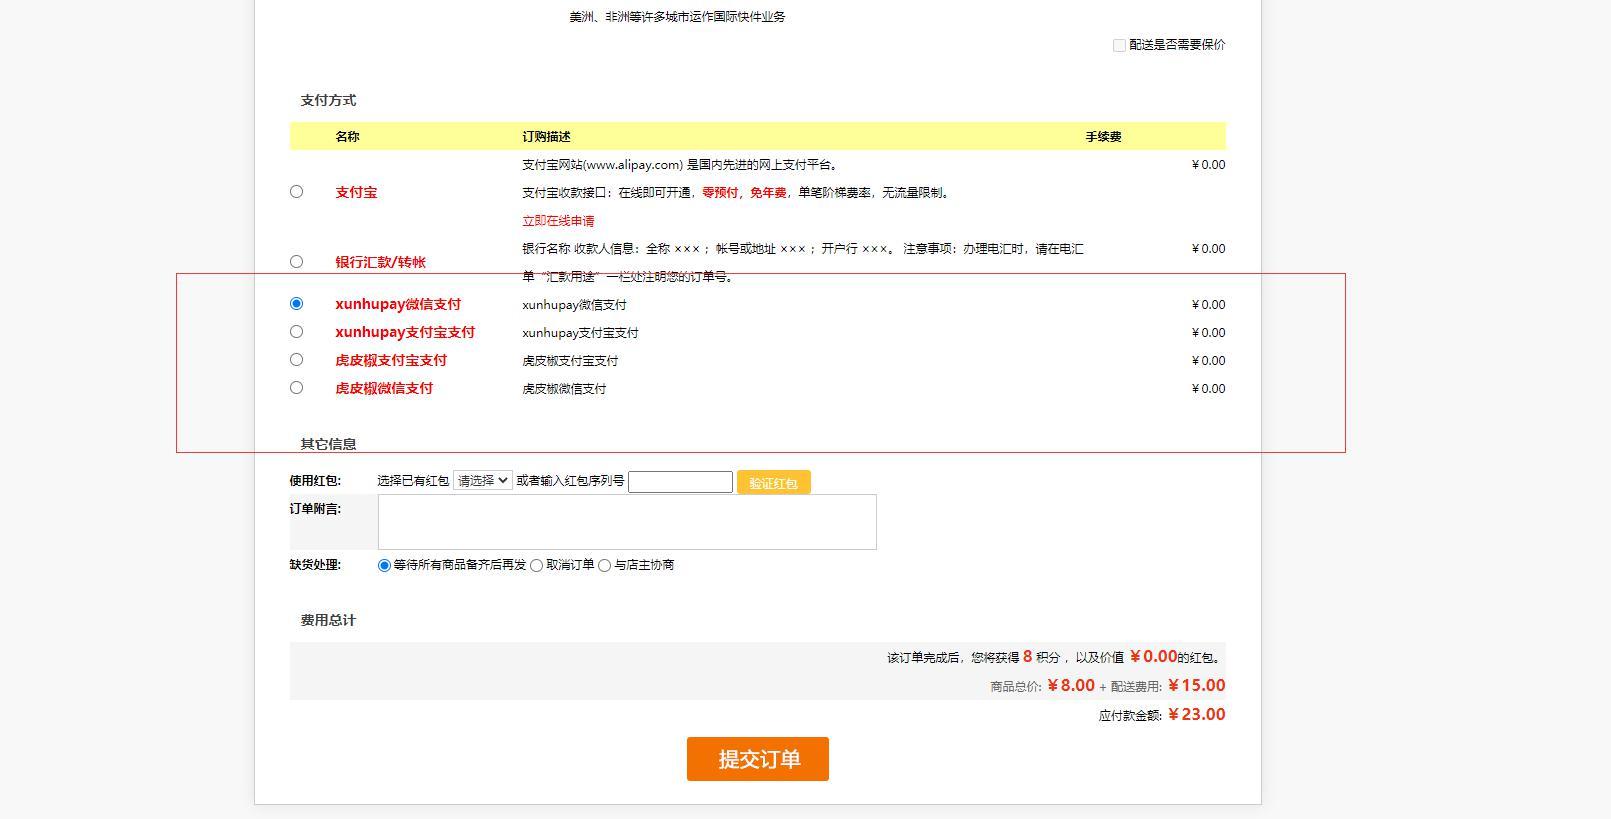 Ecshop v2.7.3商城使用微信H5支付教程